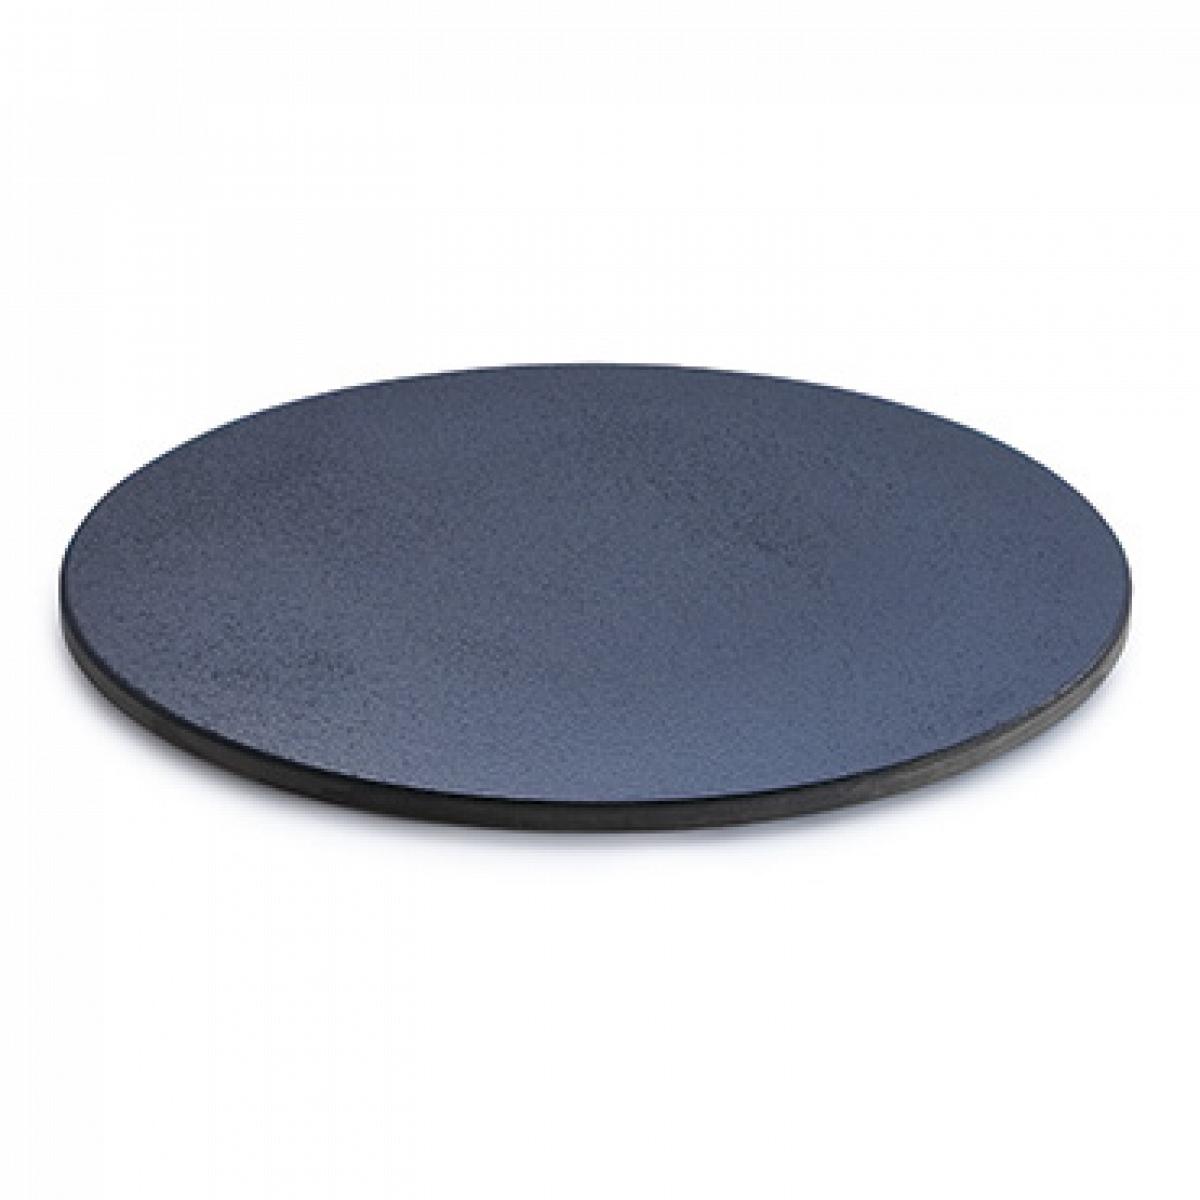 steinplatte f r lotusgrill xl lotus grill zubeh r. Black Bedroom Furniture Sets. Home Design Ideas